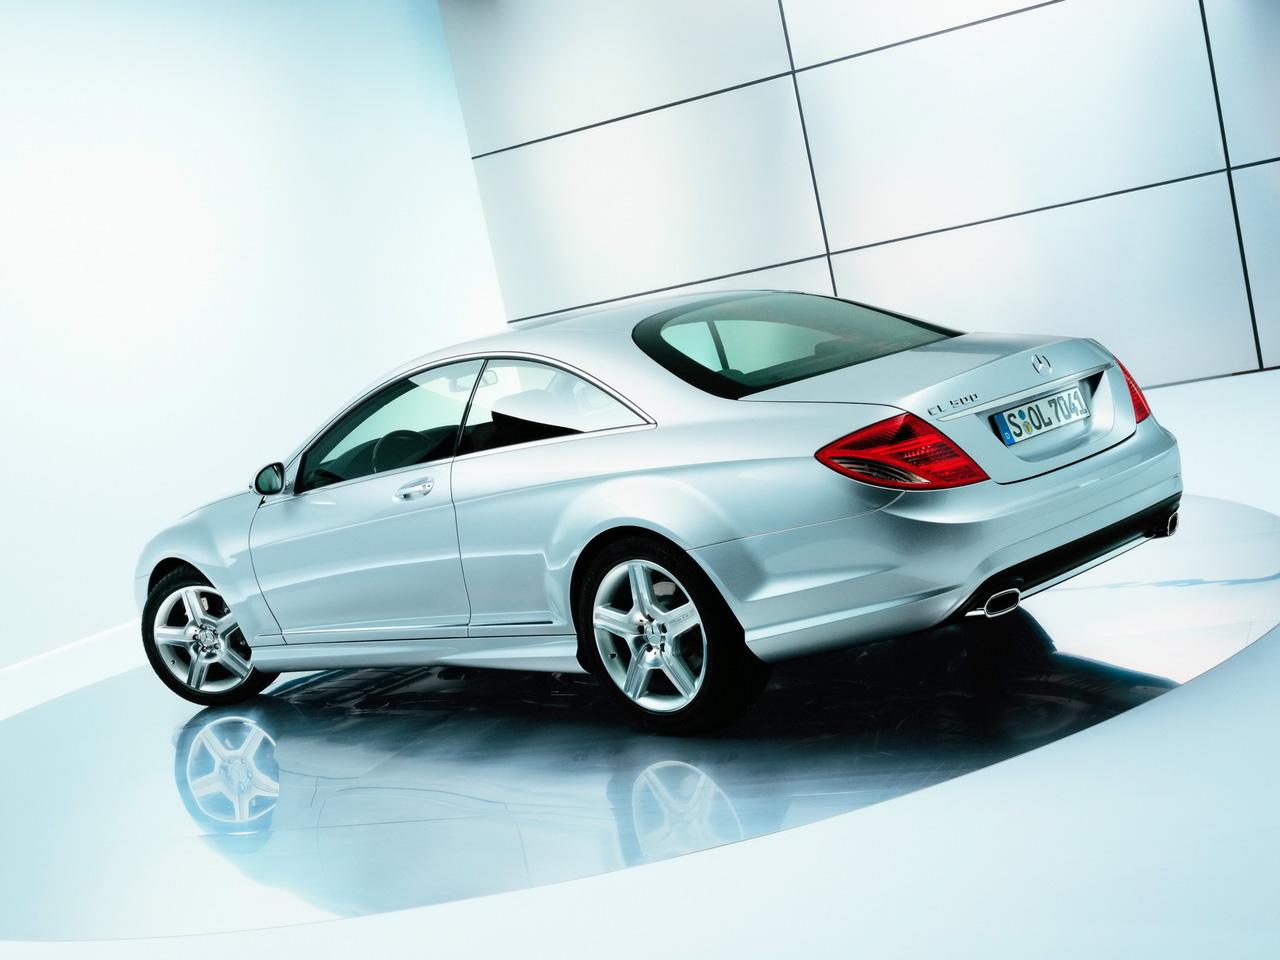 Mercedes benz cl class review and photos for Cl mercedes benz